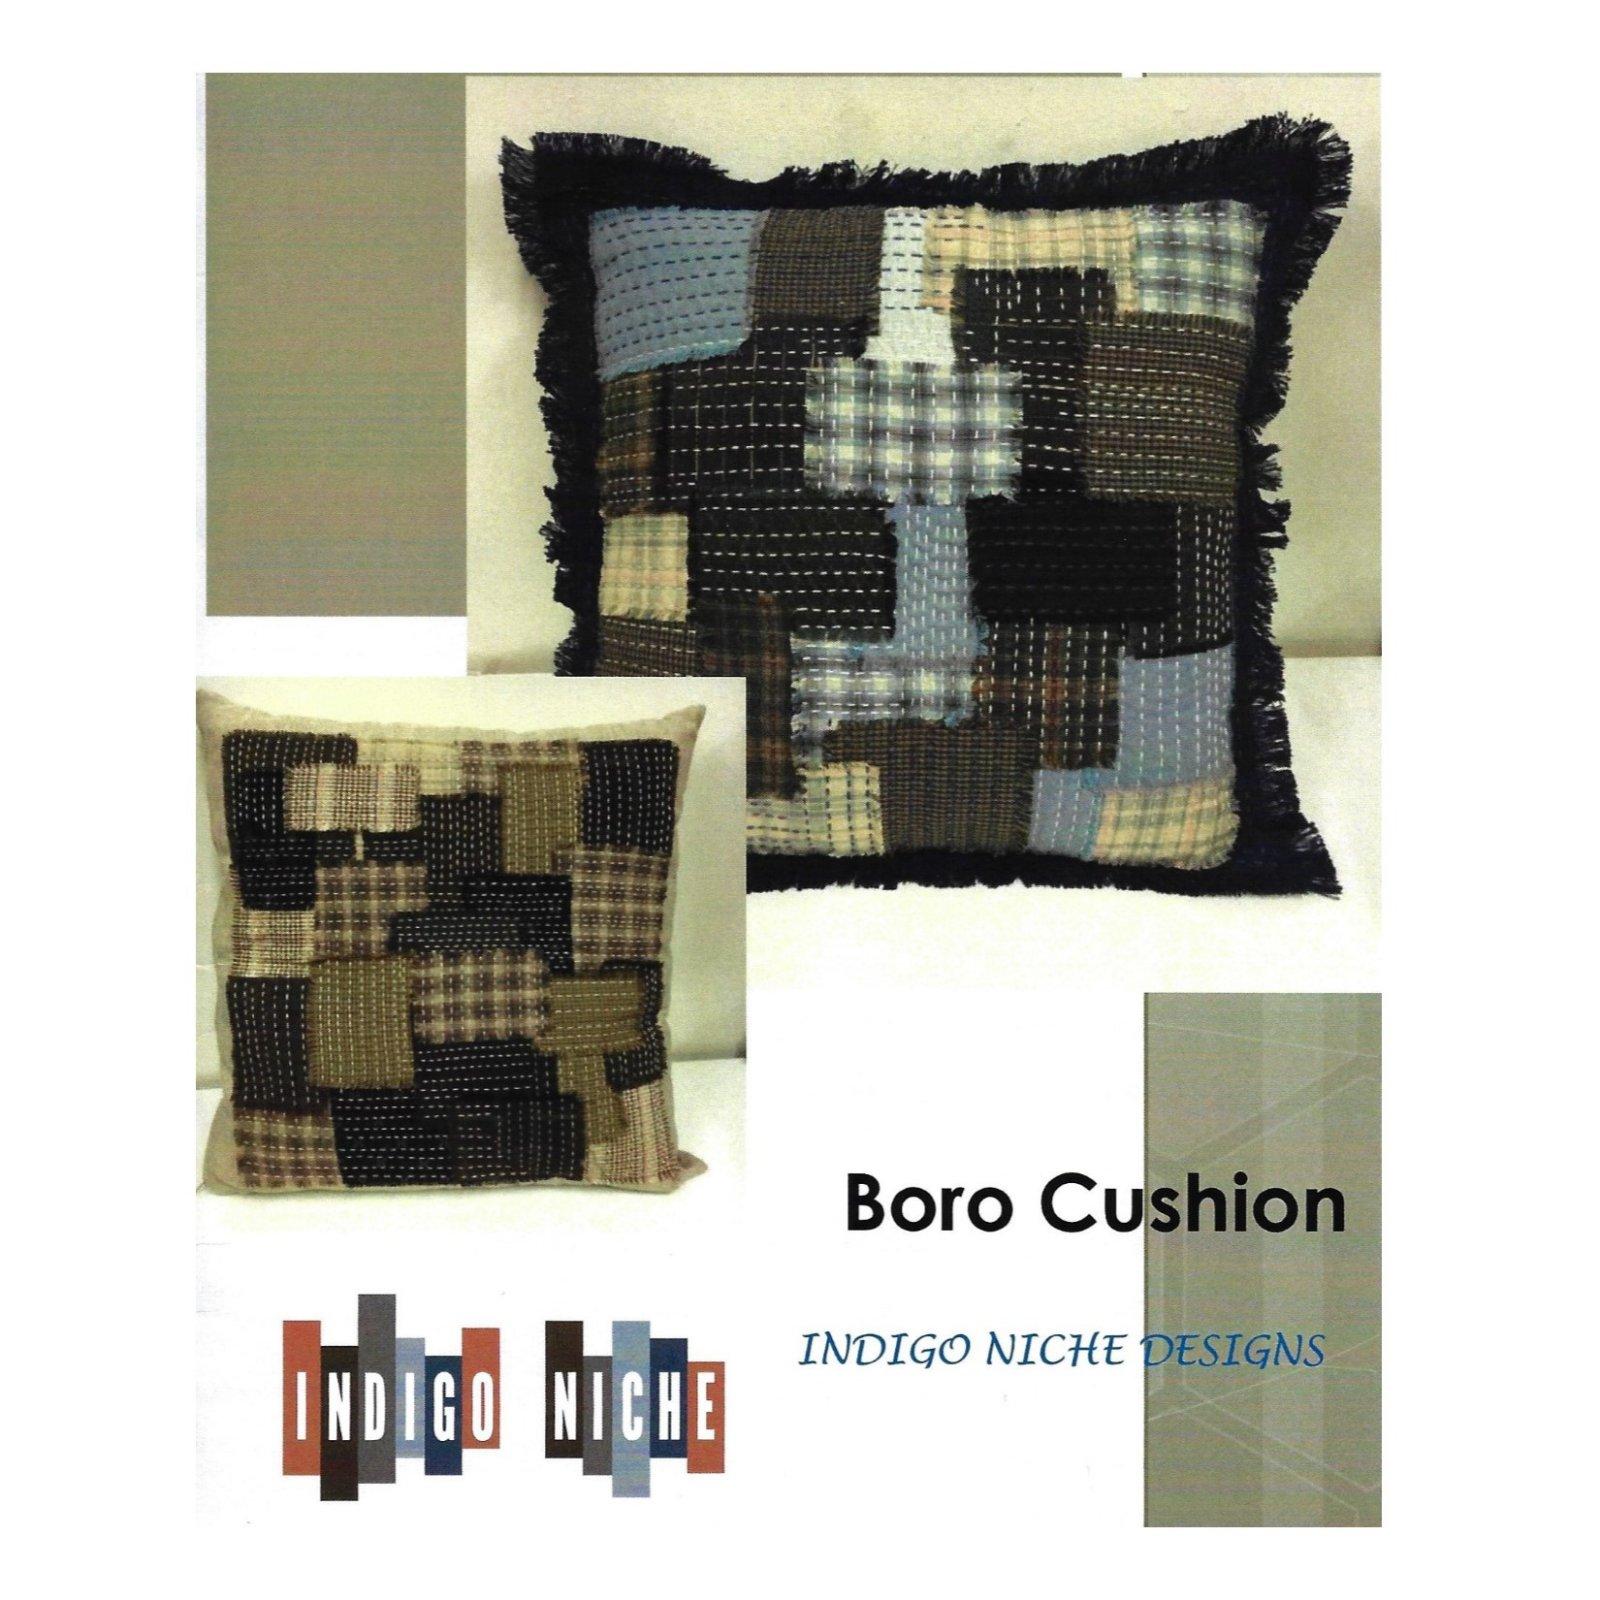 Boro Cushion Pattern from Indigo Niche